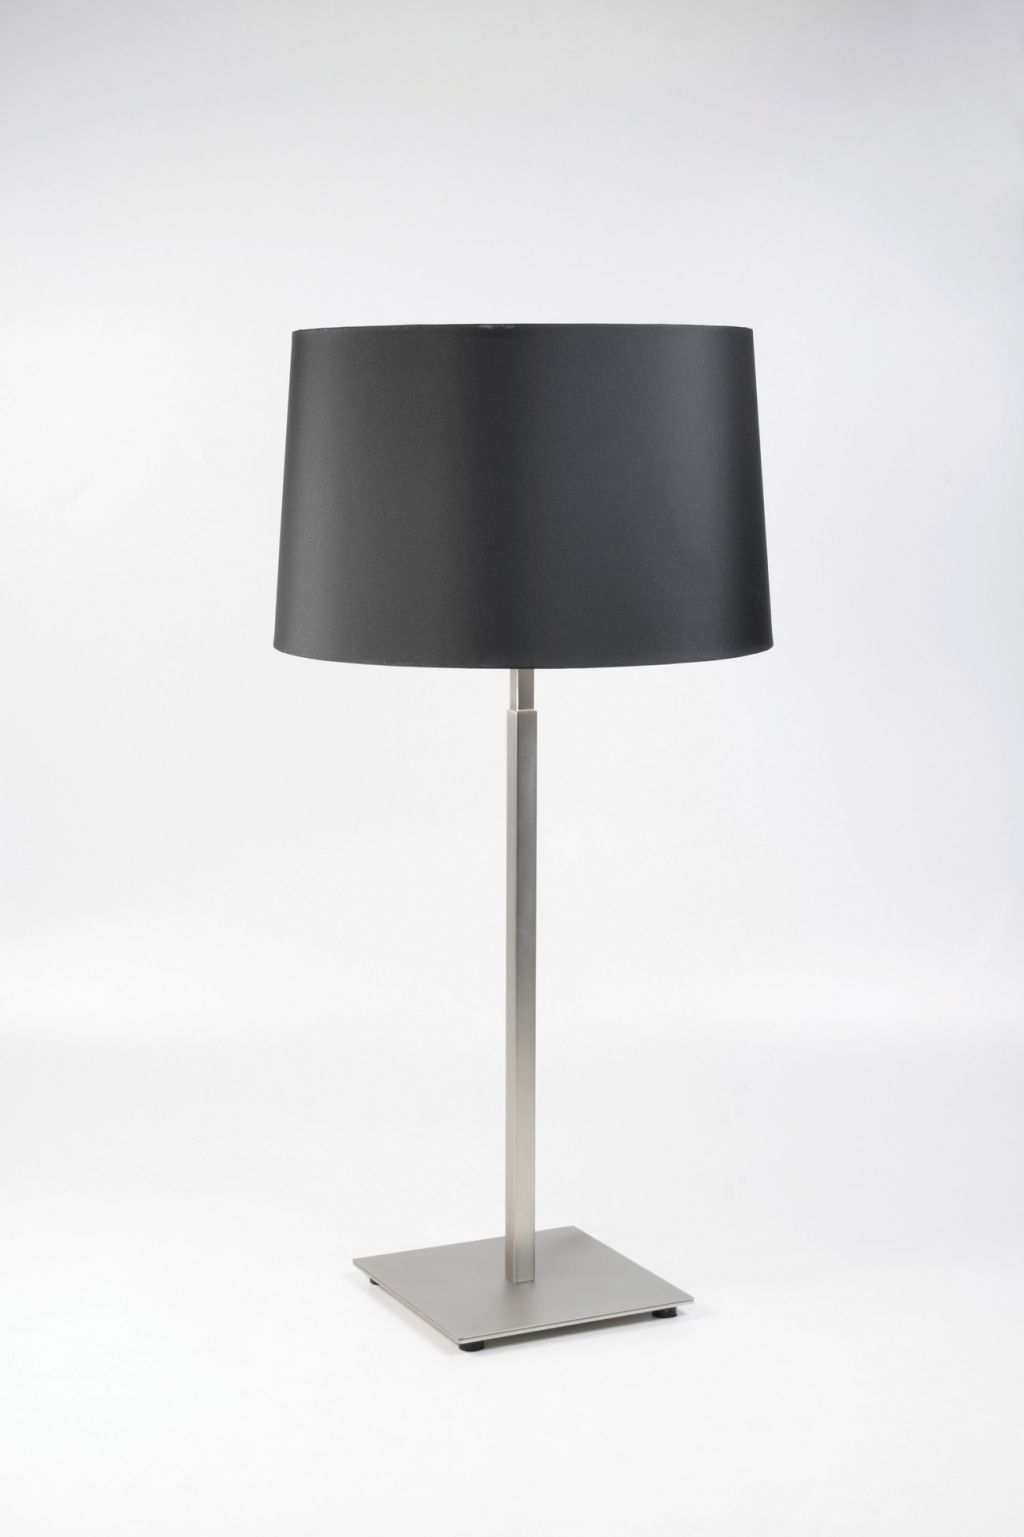 ASTRO Azumi table lamp matt nickel without shade (1142022)